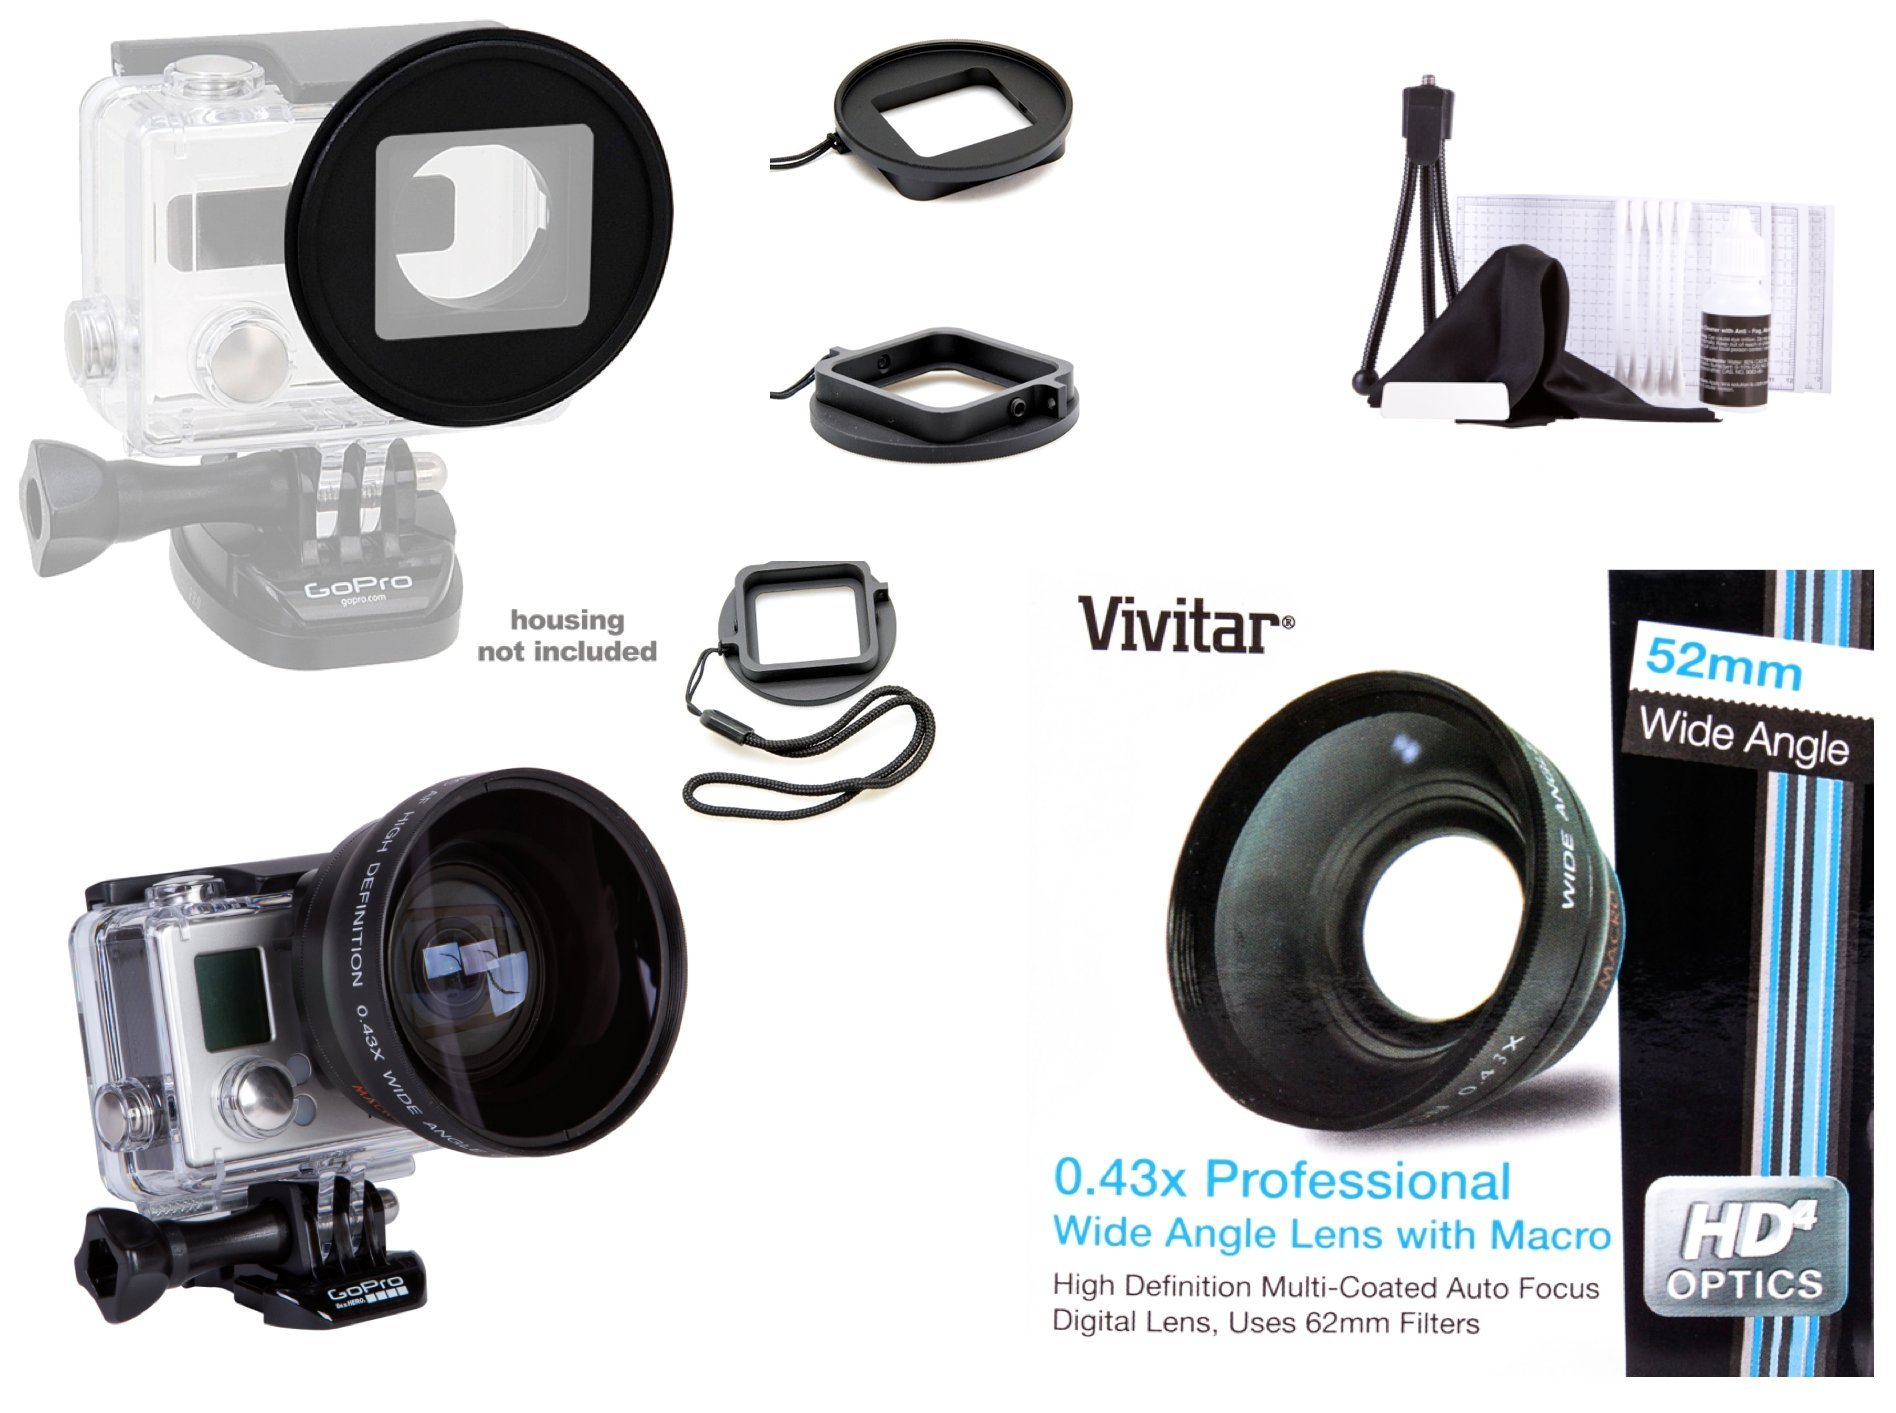 Vivitar 52mm Ring Filter Adapter for GoPro HERO3/ HERO3+/ HERO4 + 52mm Vivitar Professional HD .43x Wide Angle Lens with Macro (MPN: V-52W)